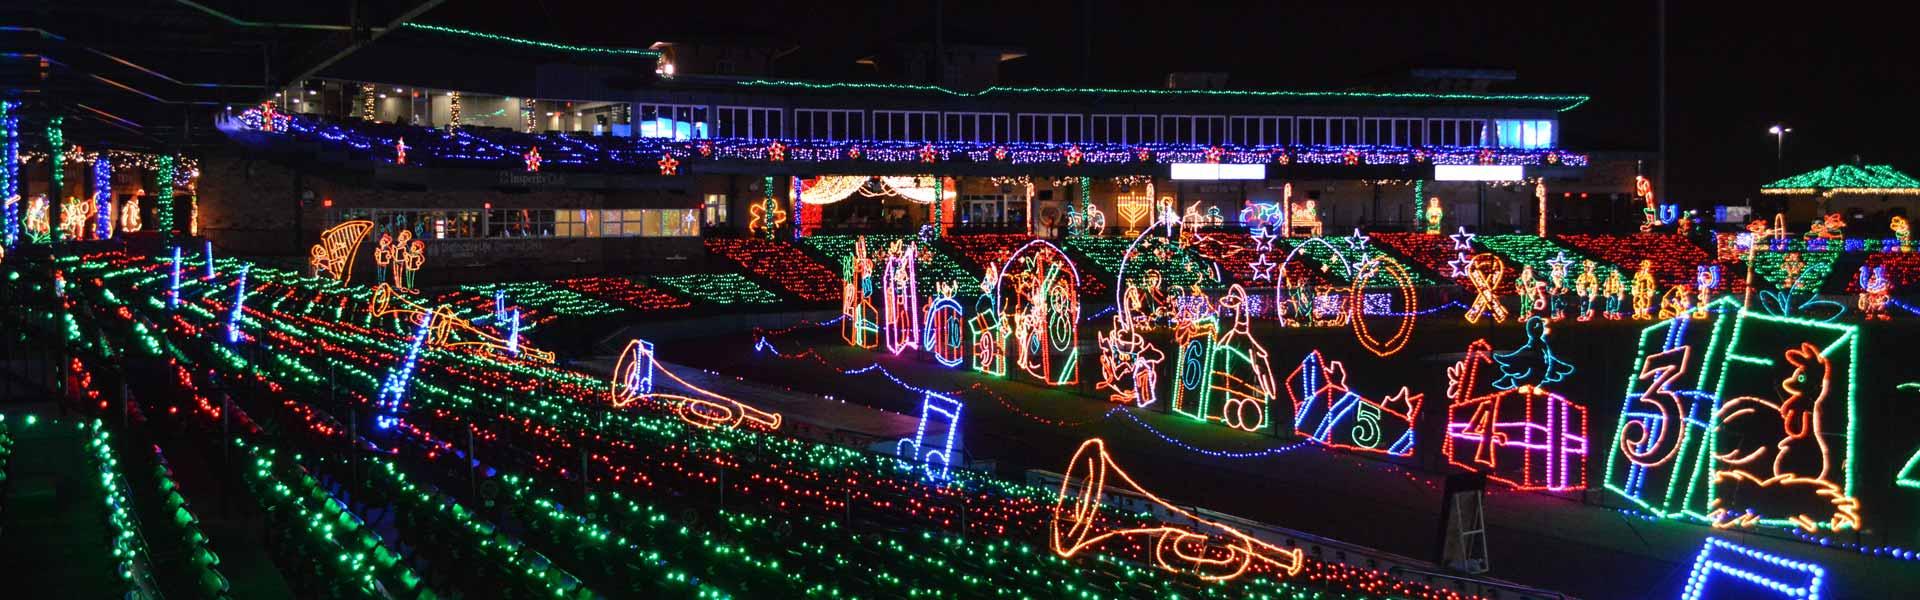 Events | Sugar Land Holiday Lights